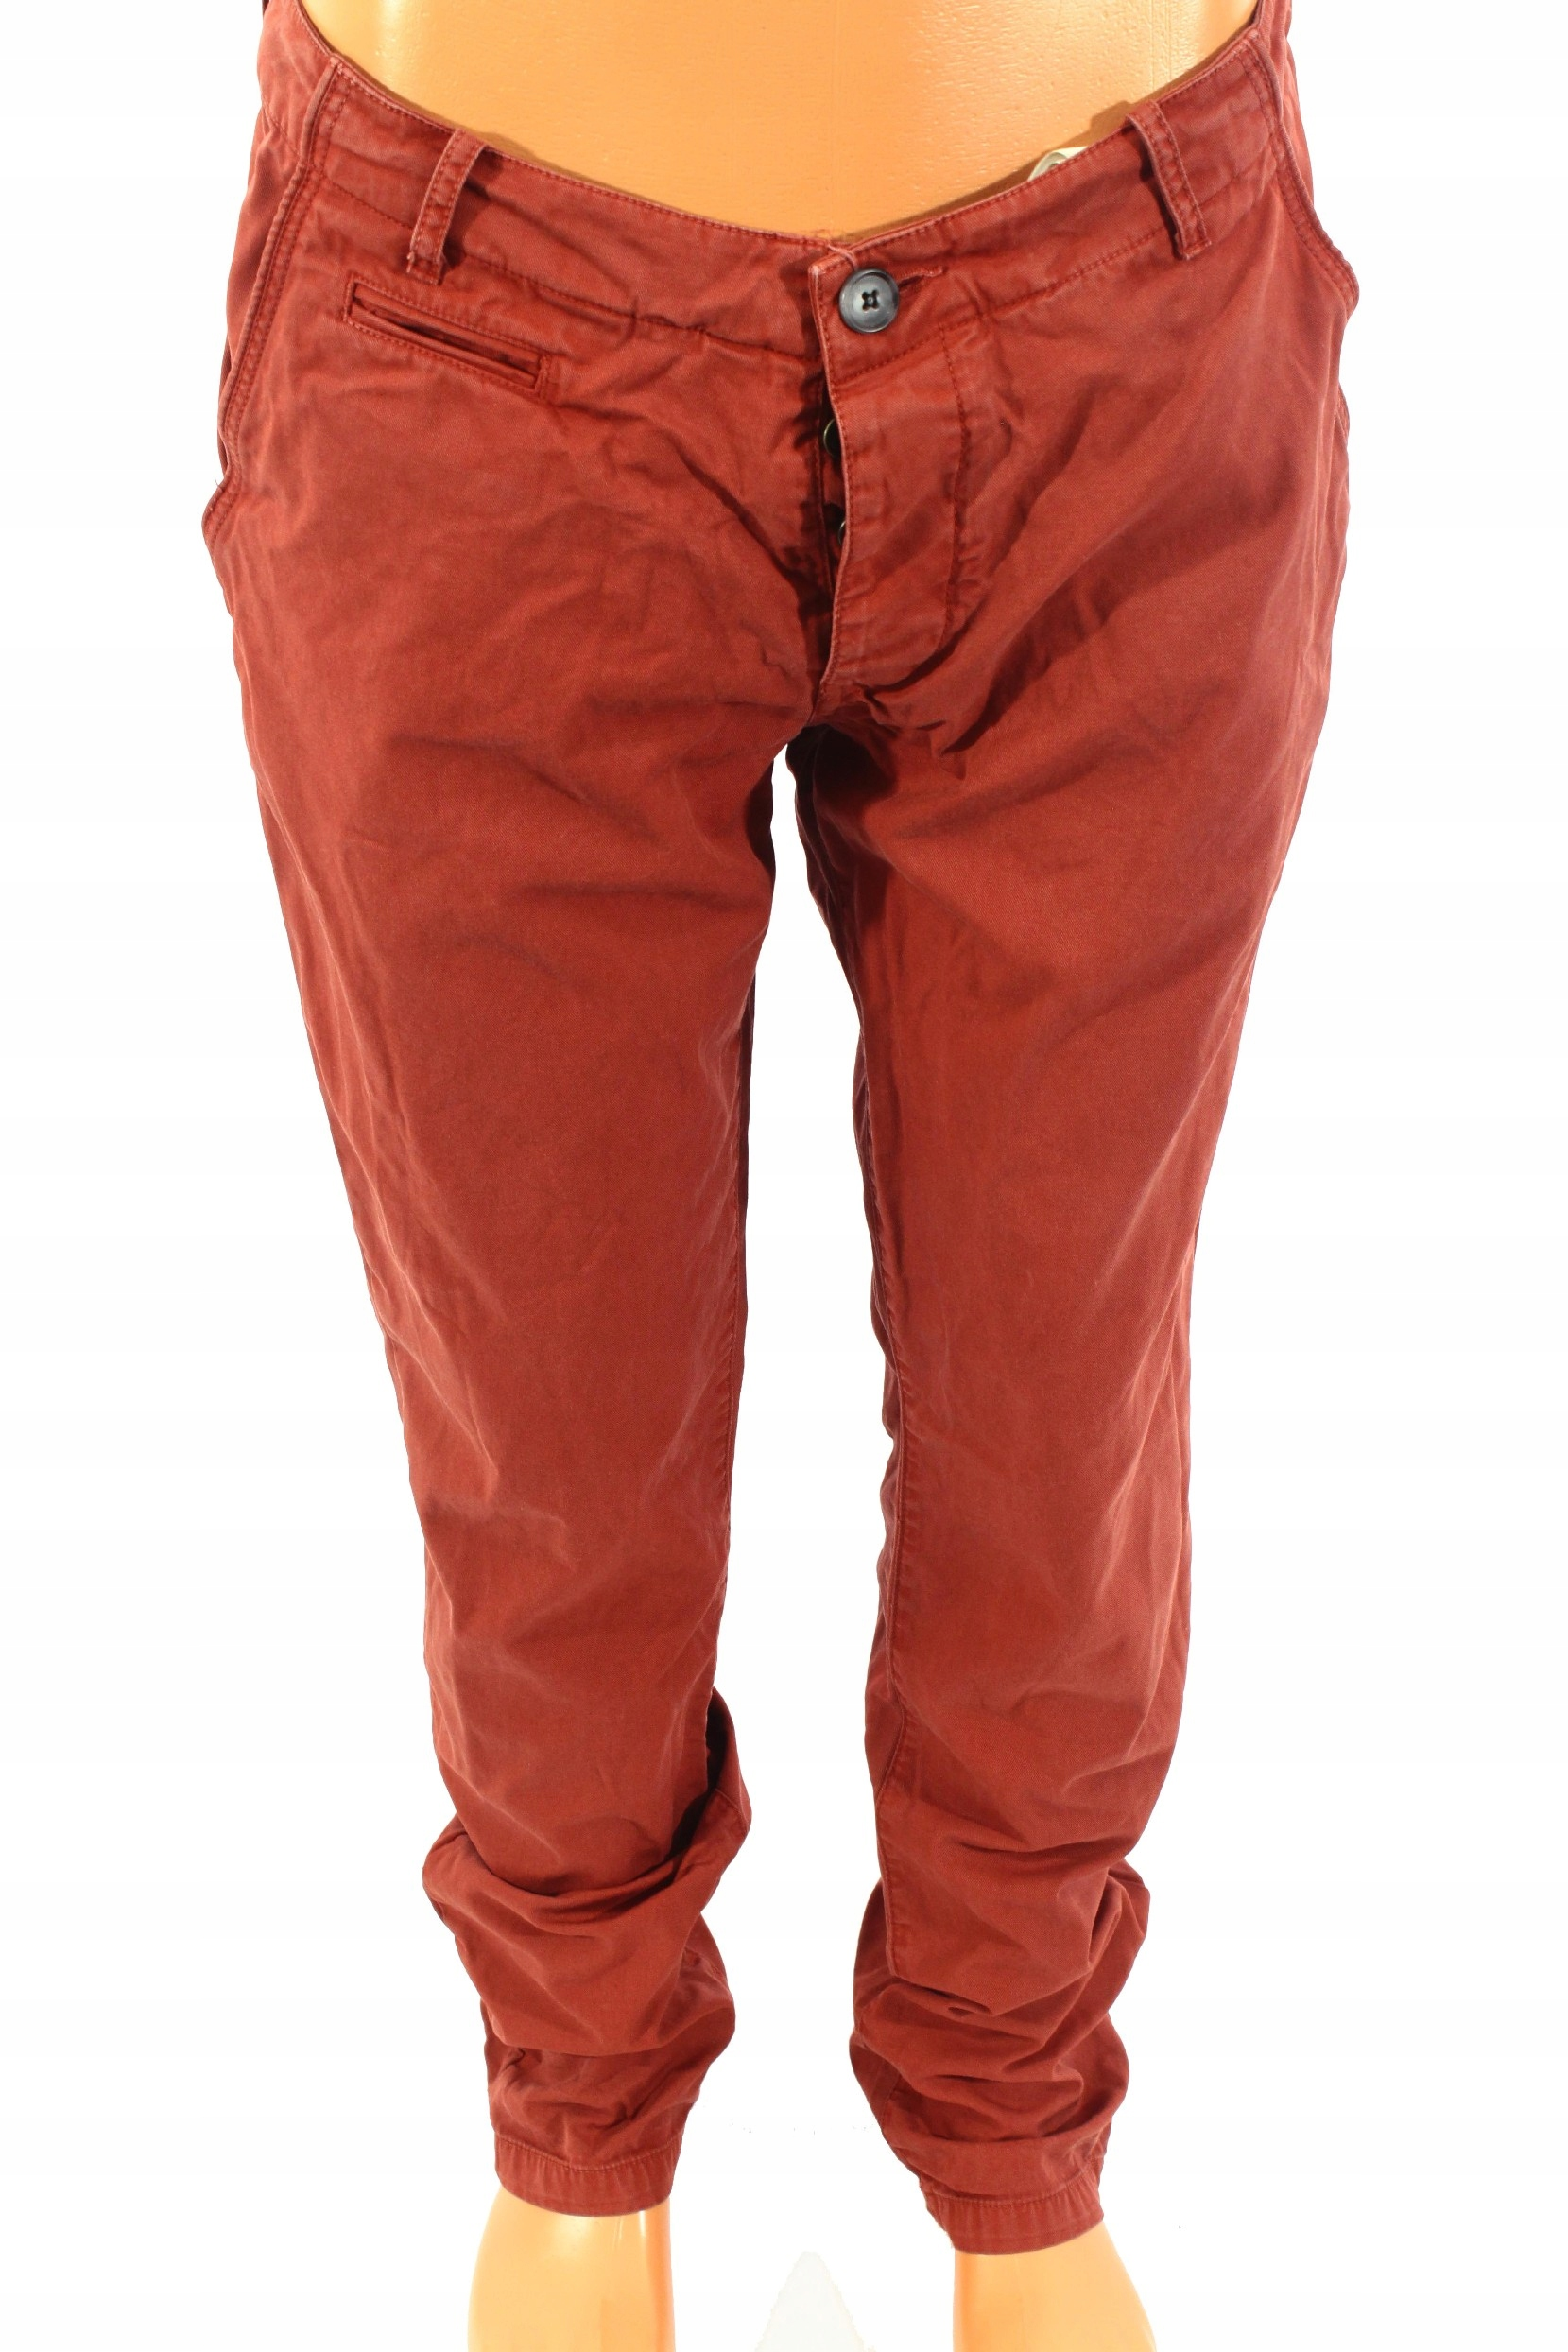 WRANGLER CHINO Spodnie chinosy! W33 L32 Pas 90